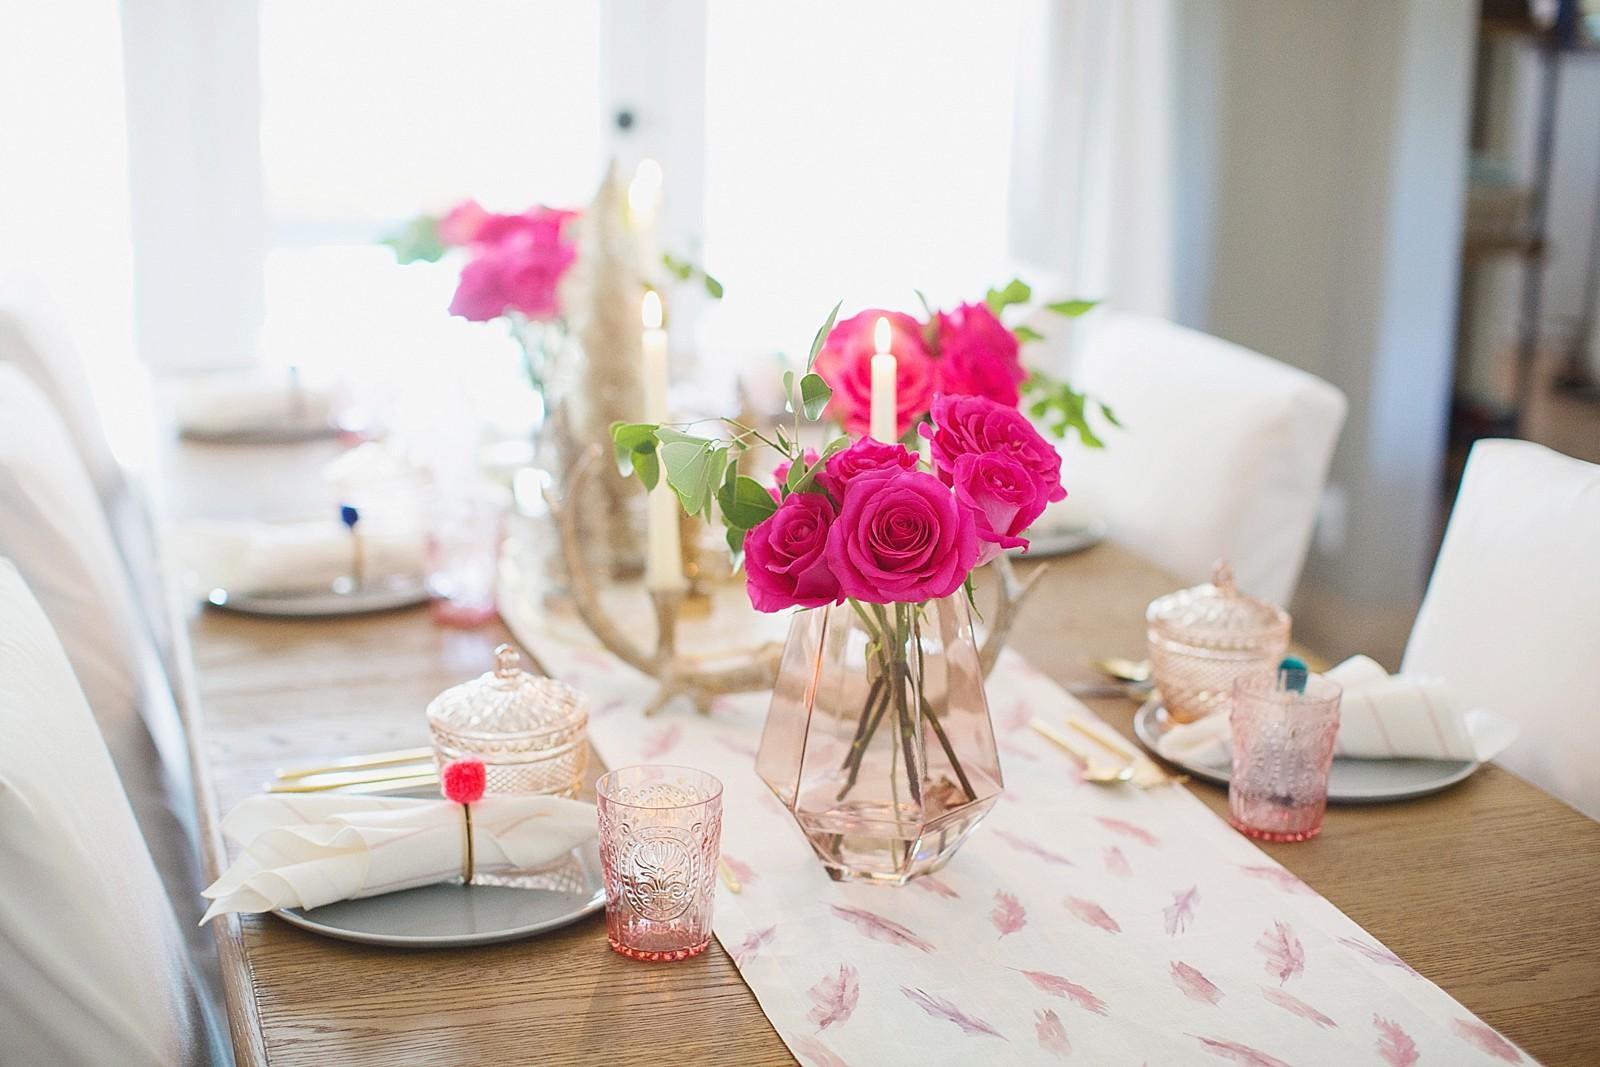 minted-christmas-inspiration-girls-party-photos-diana-elizabeth-blog-lifestyle-hostess-entertainment-home-blog-2252